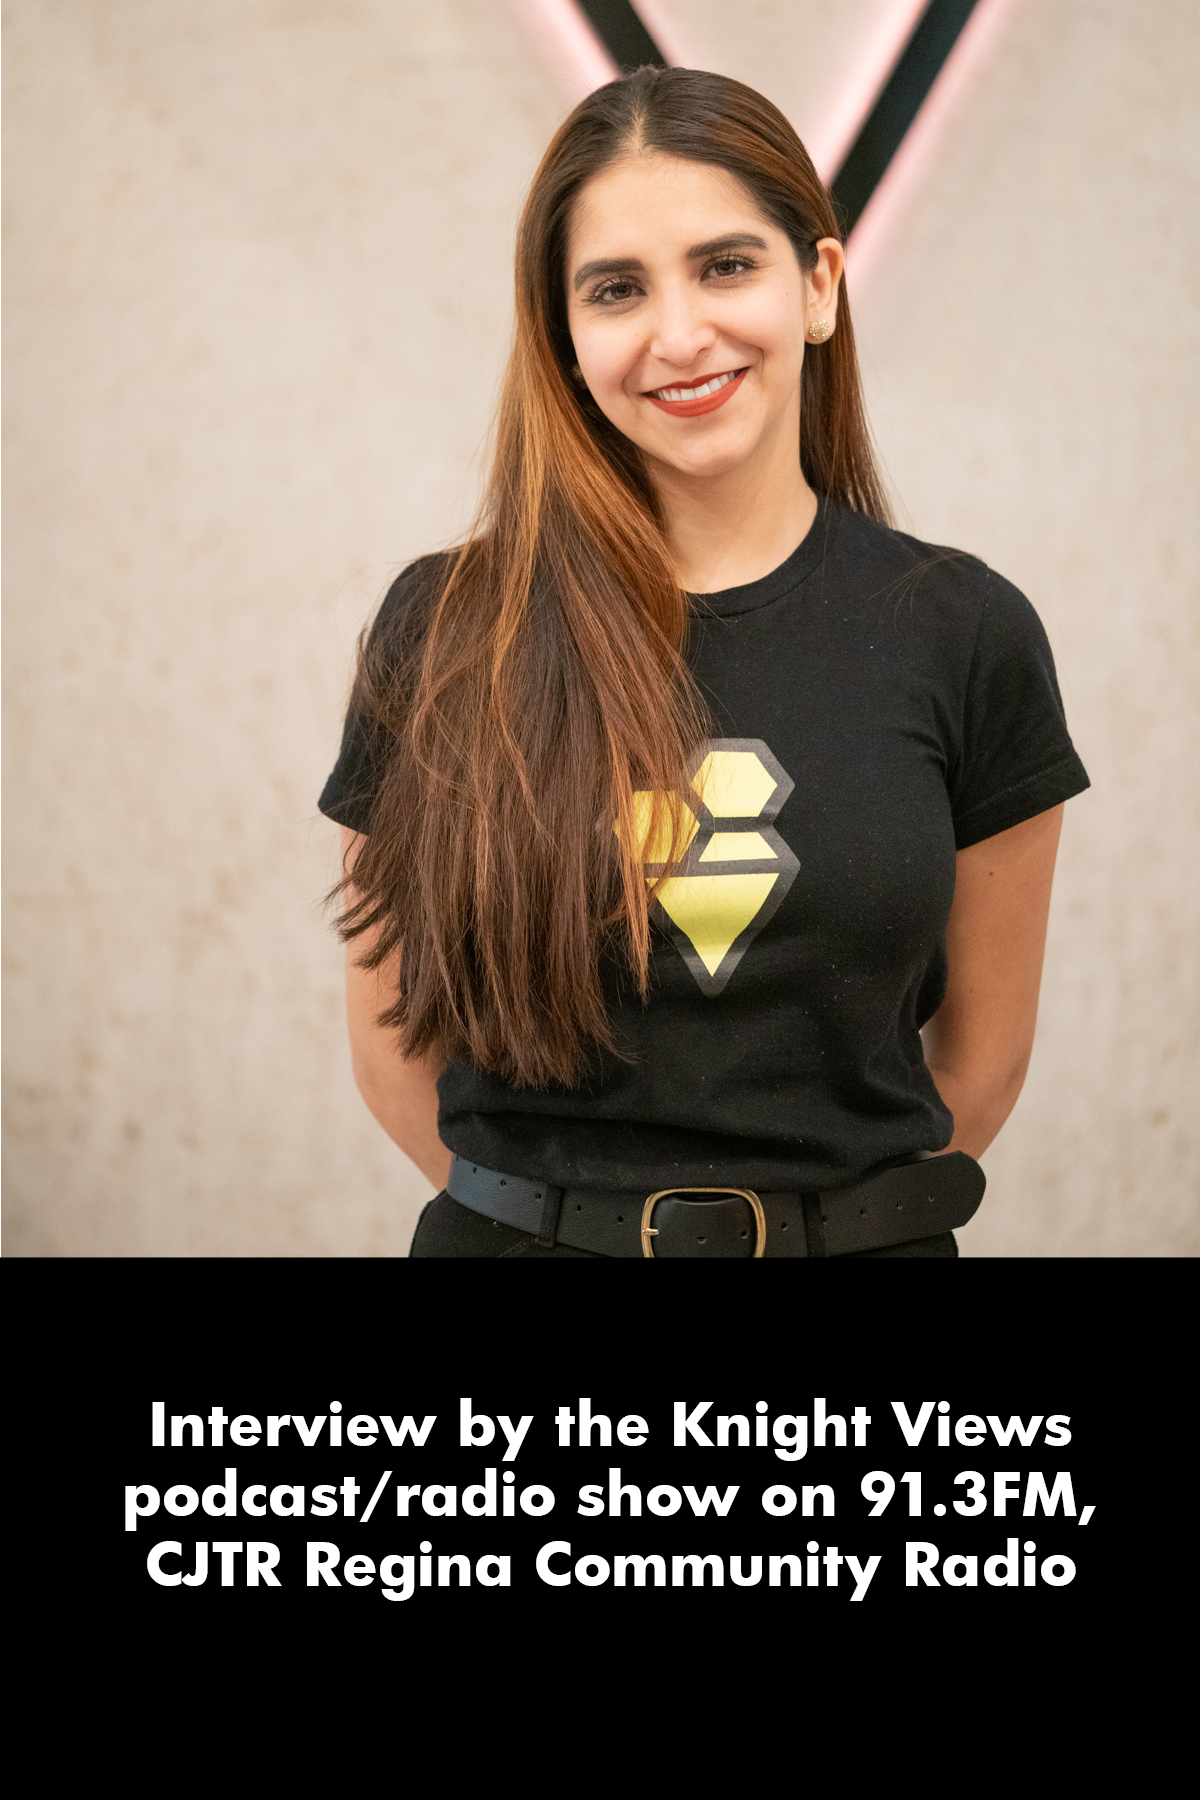 CJTR Radio Interview